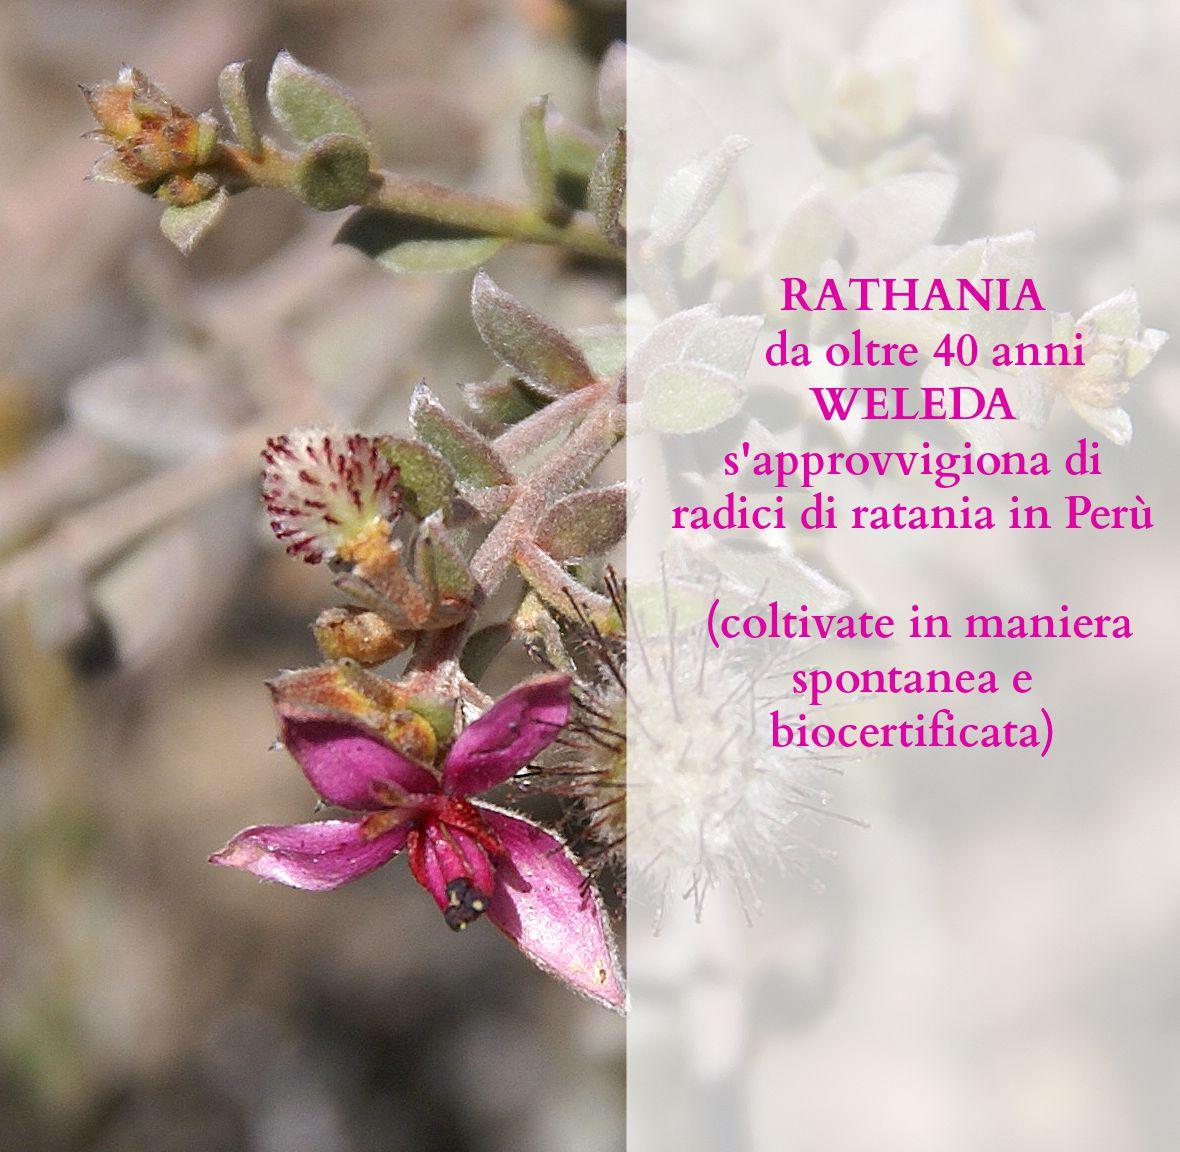 Rathania-text